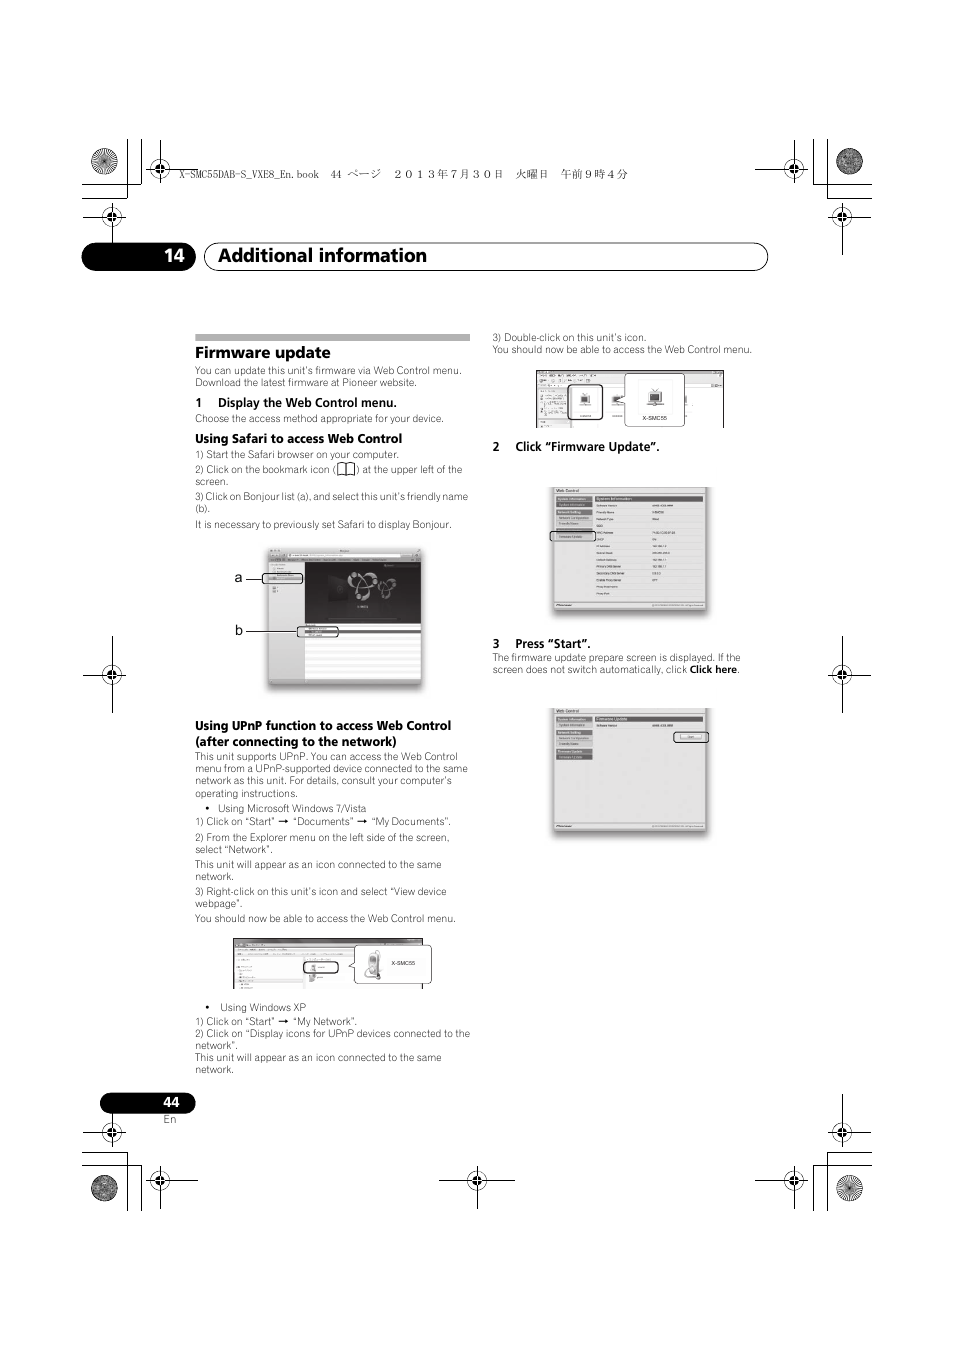 Firmware update, Additional information 14   Pioneer X